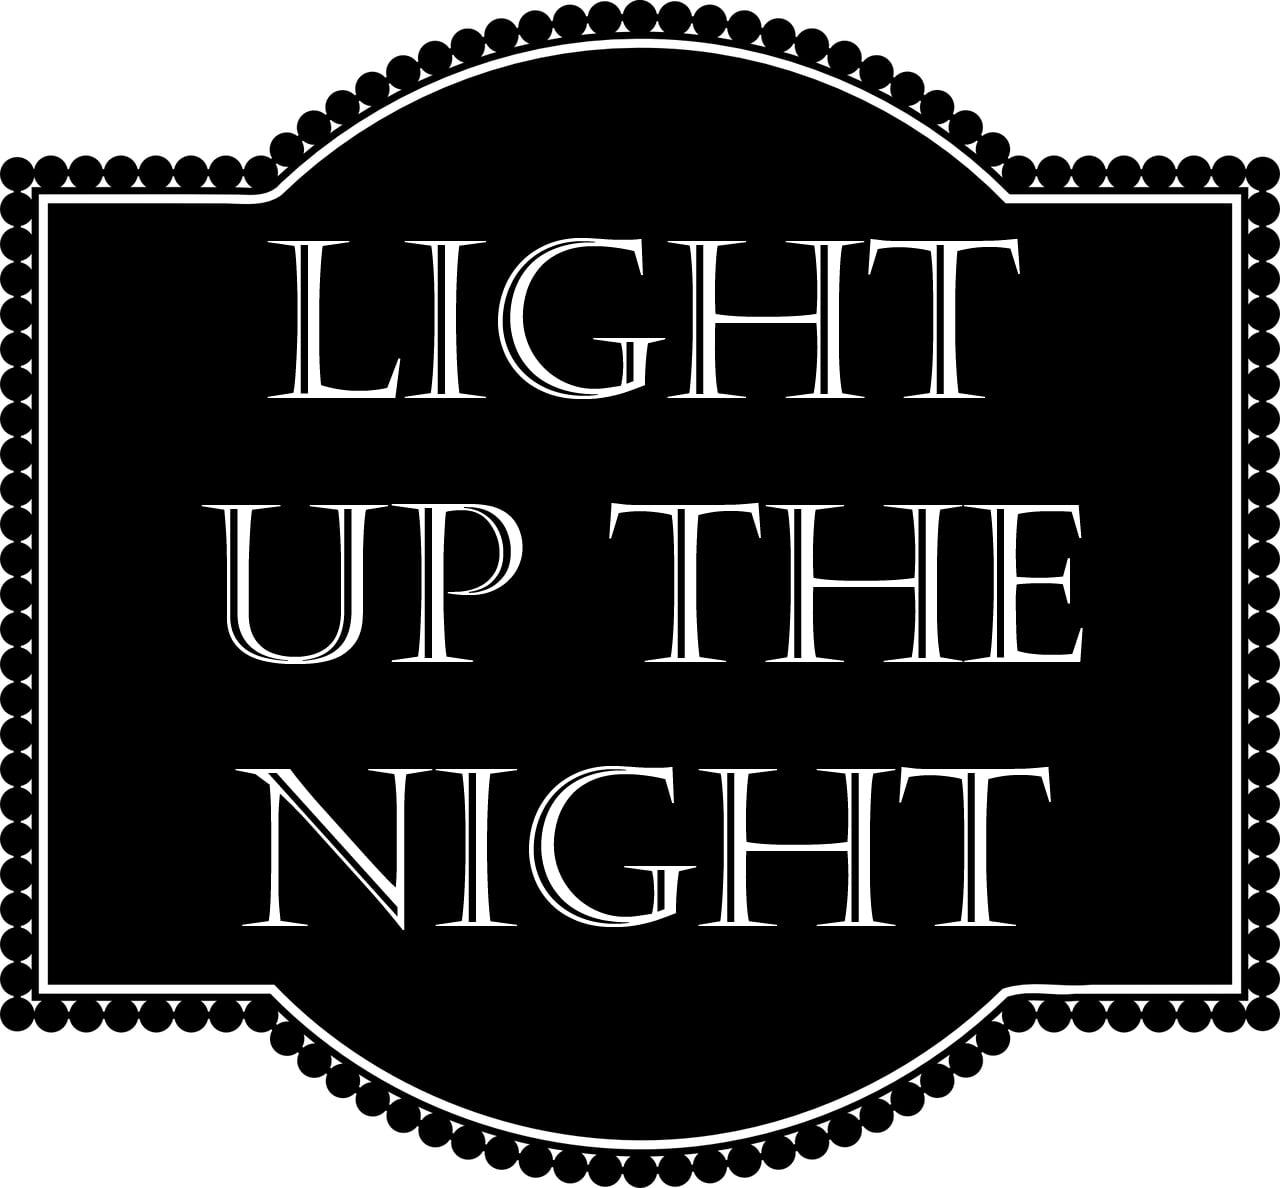 2018 Hot LED Flashing Lights Magic Wand Star up Glow Sticks New Year/'s Party